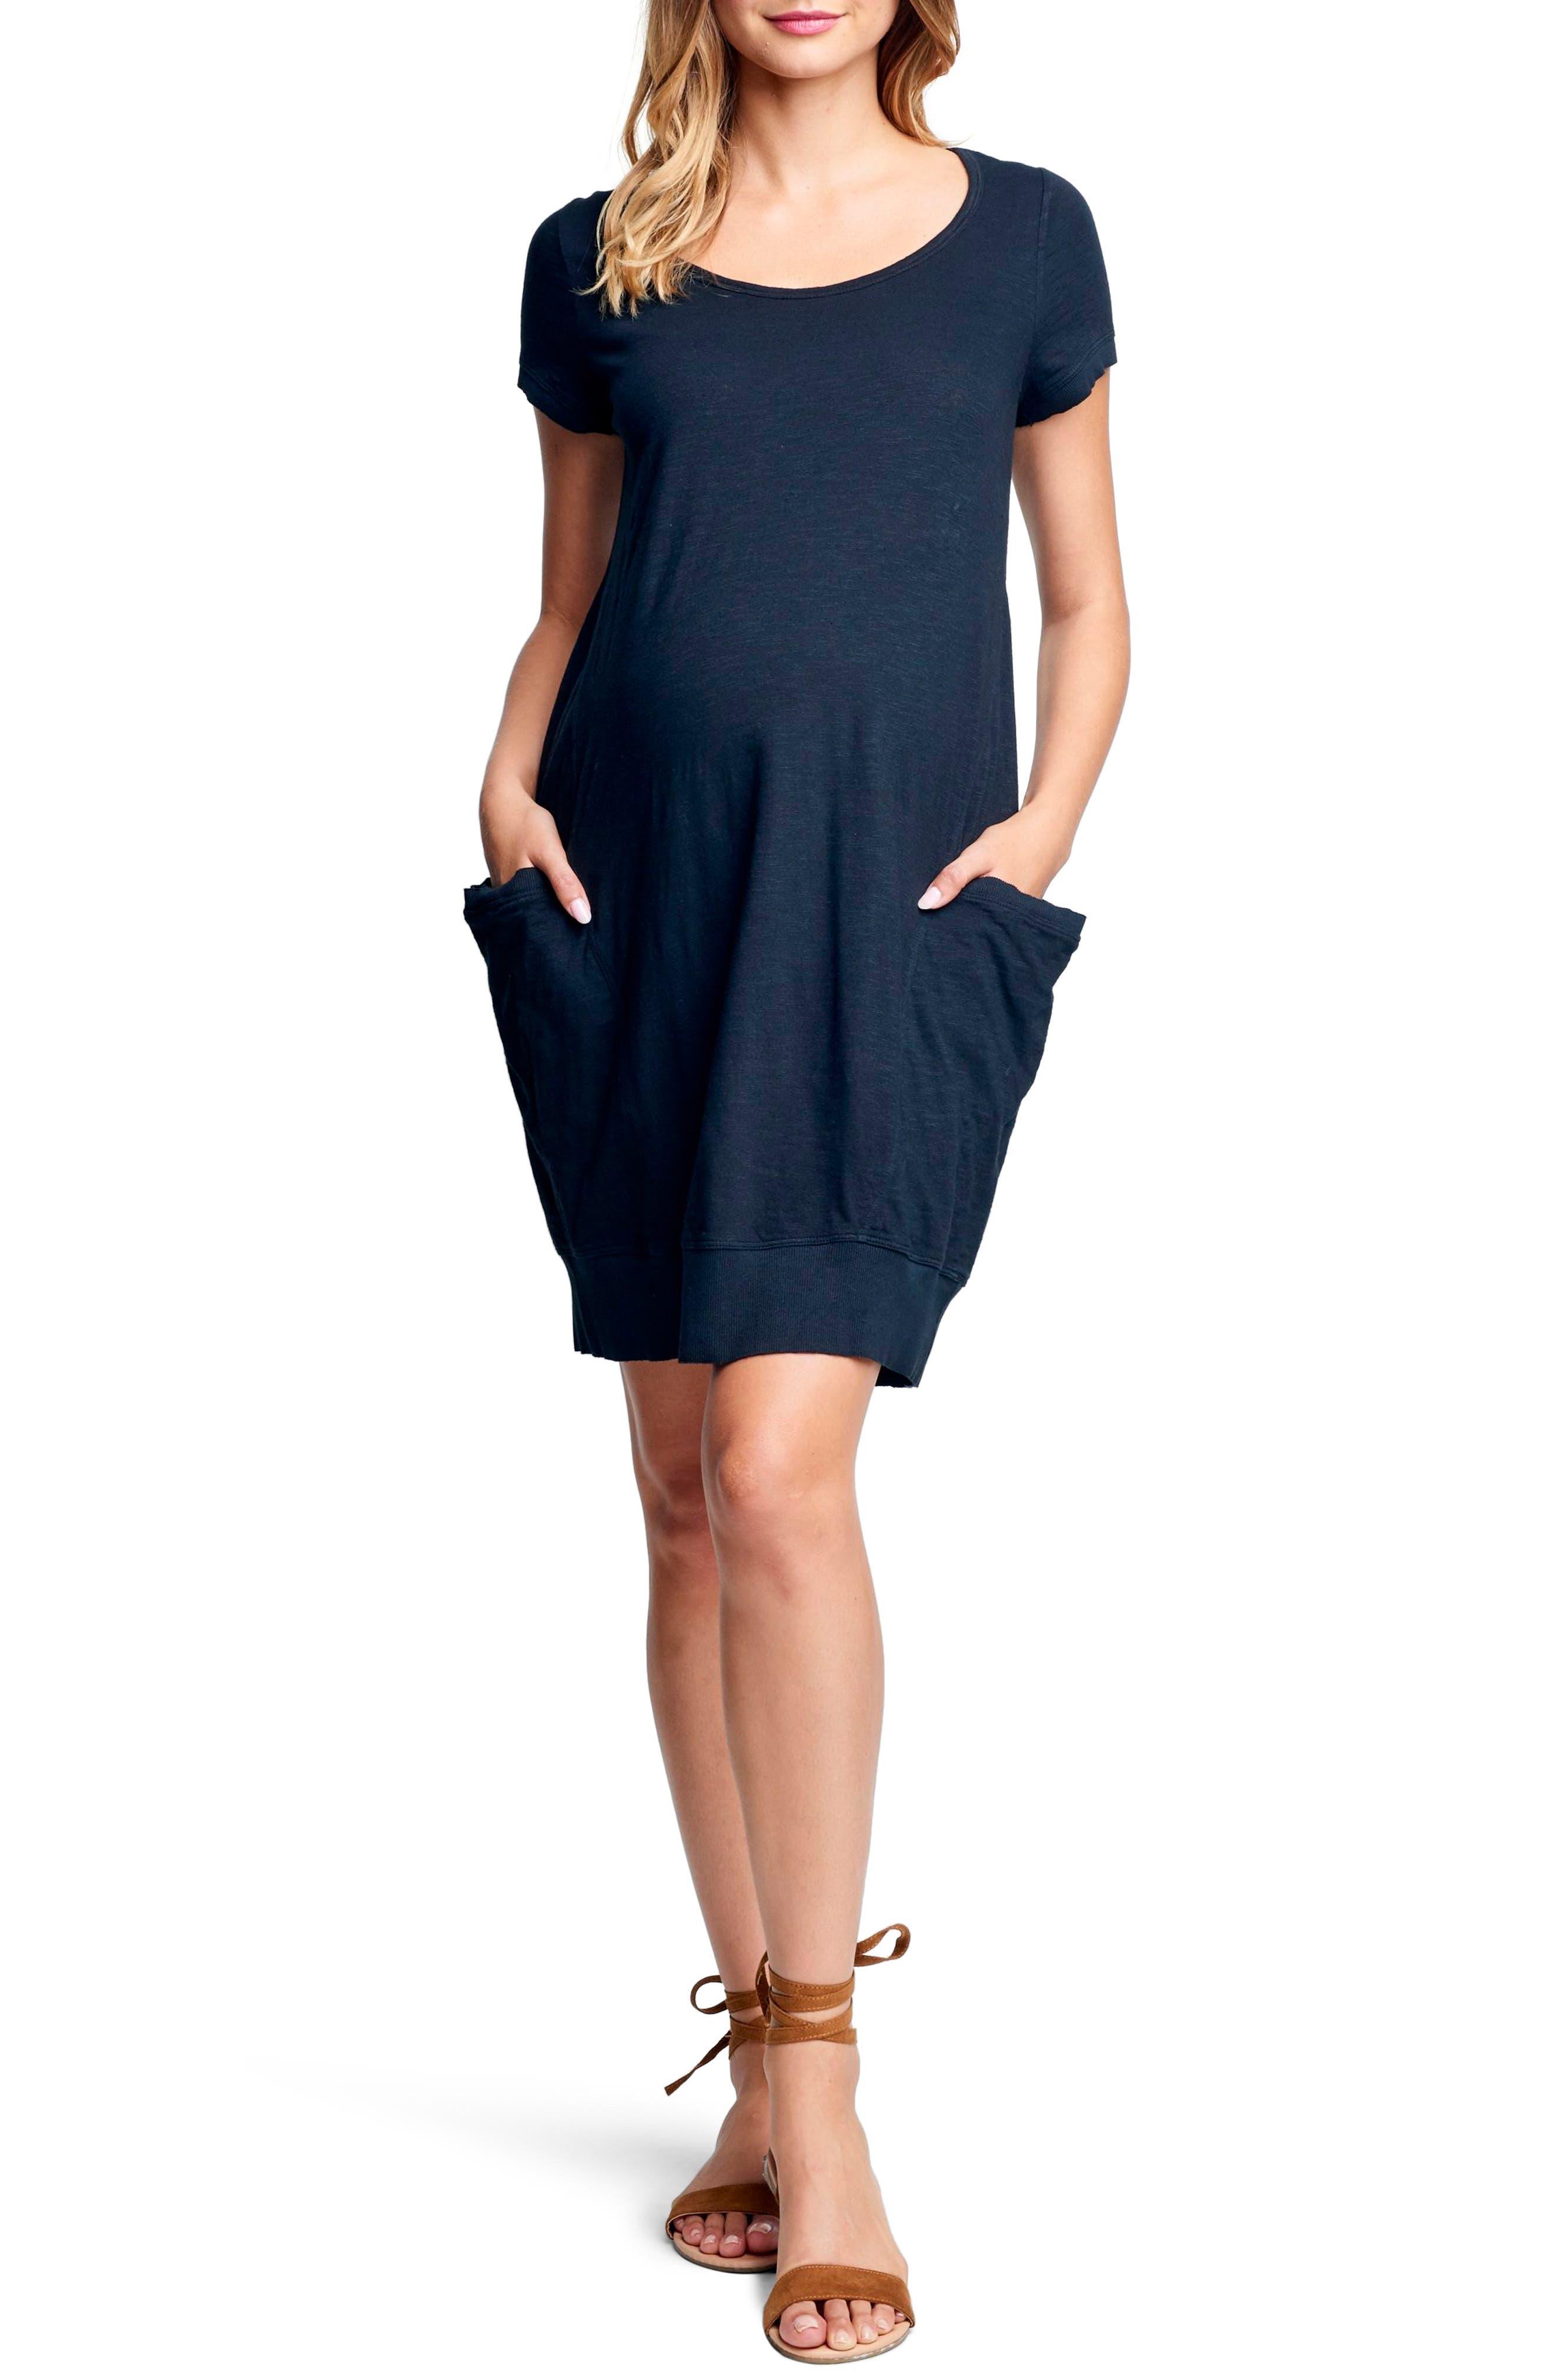 Maternal America Side Pocket Maternity Dress, Black